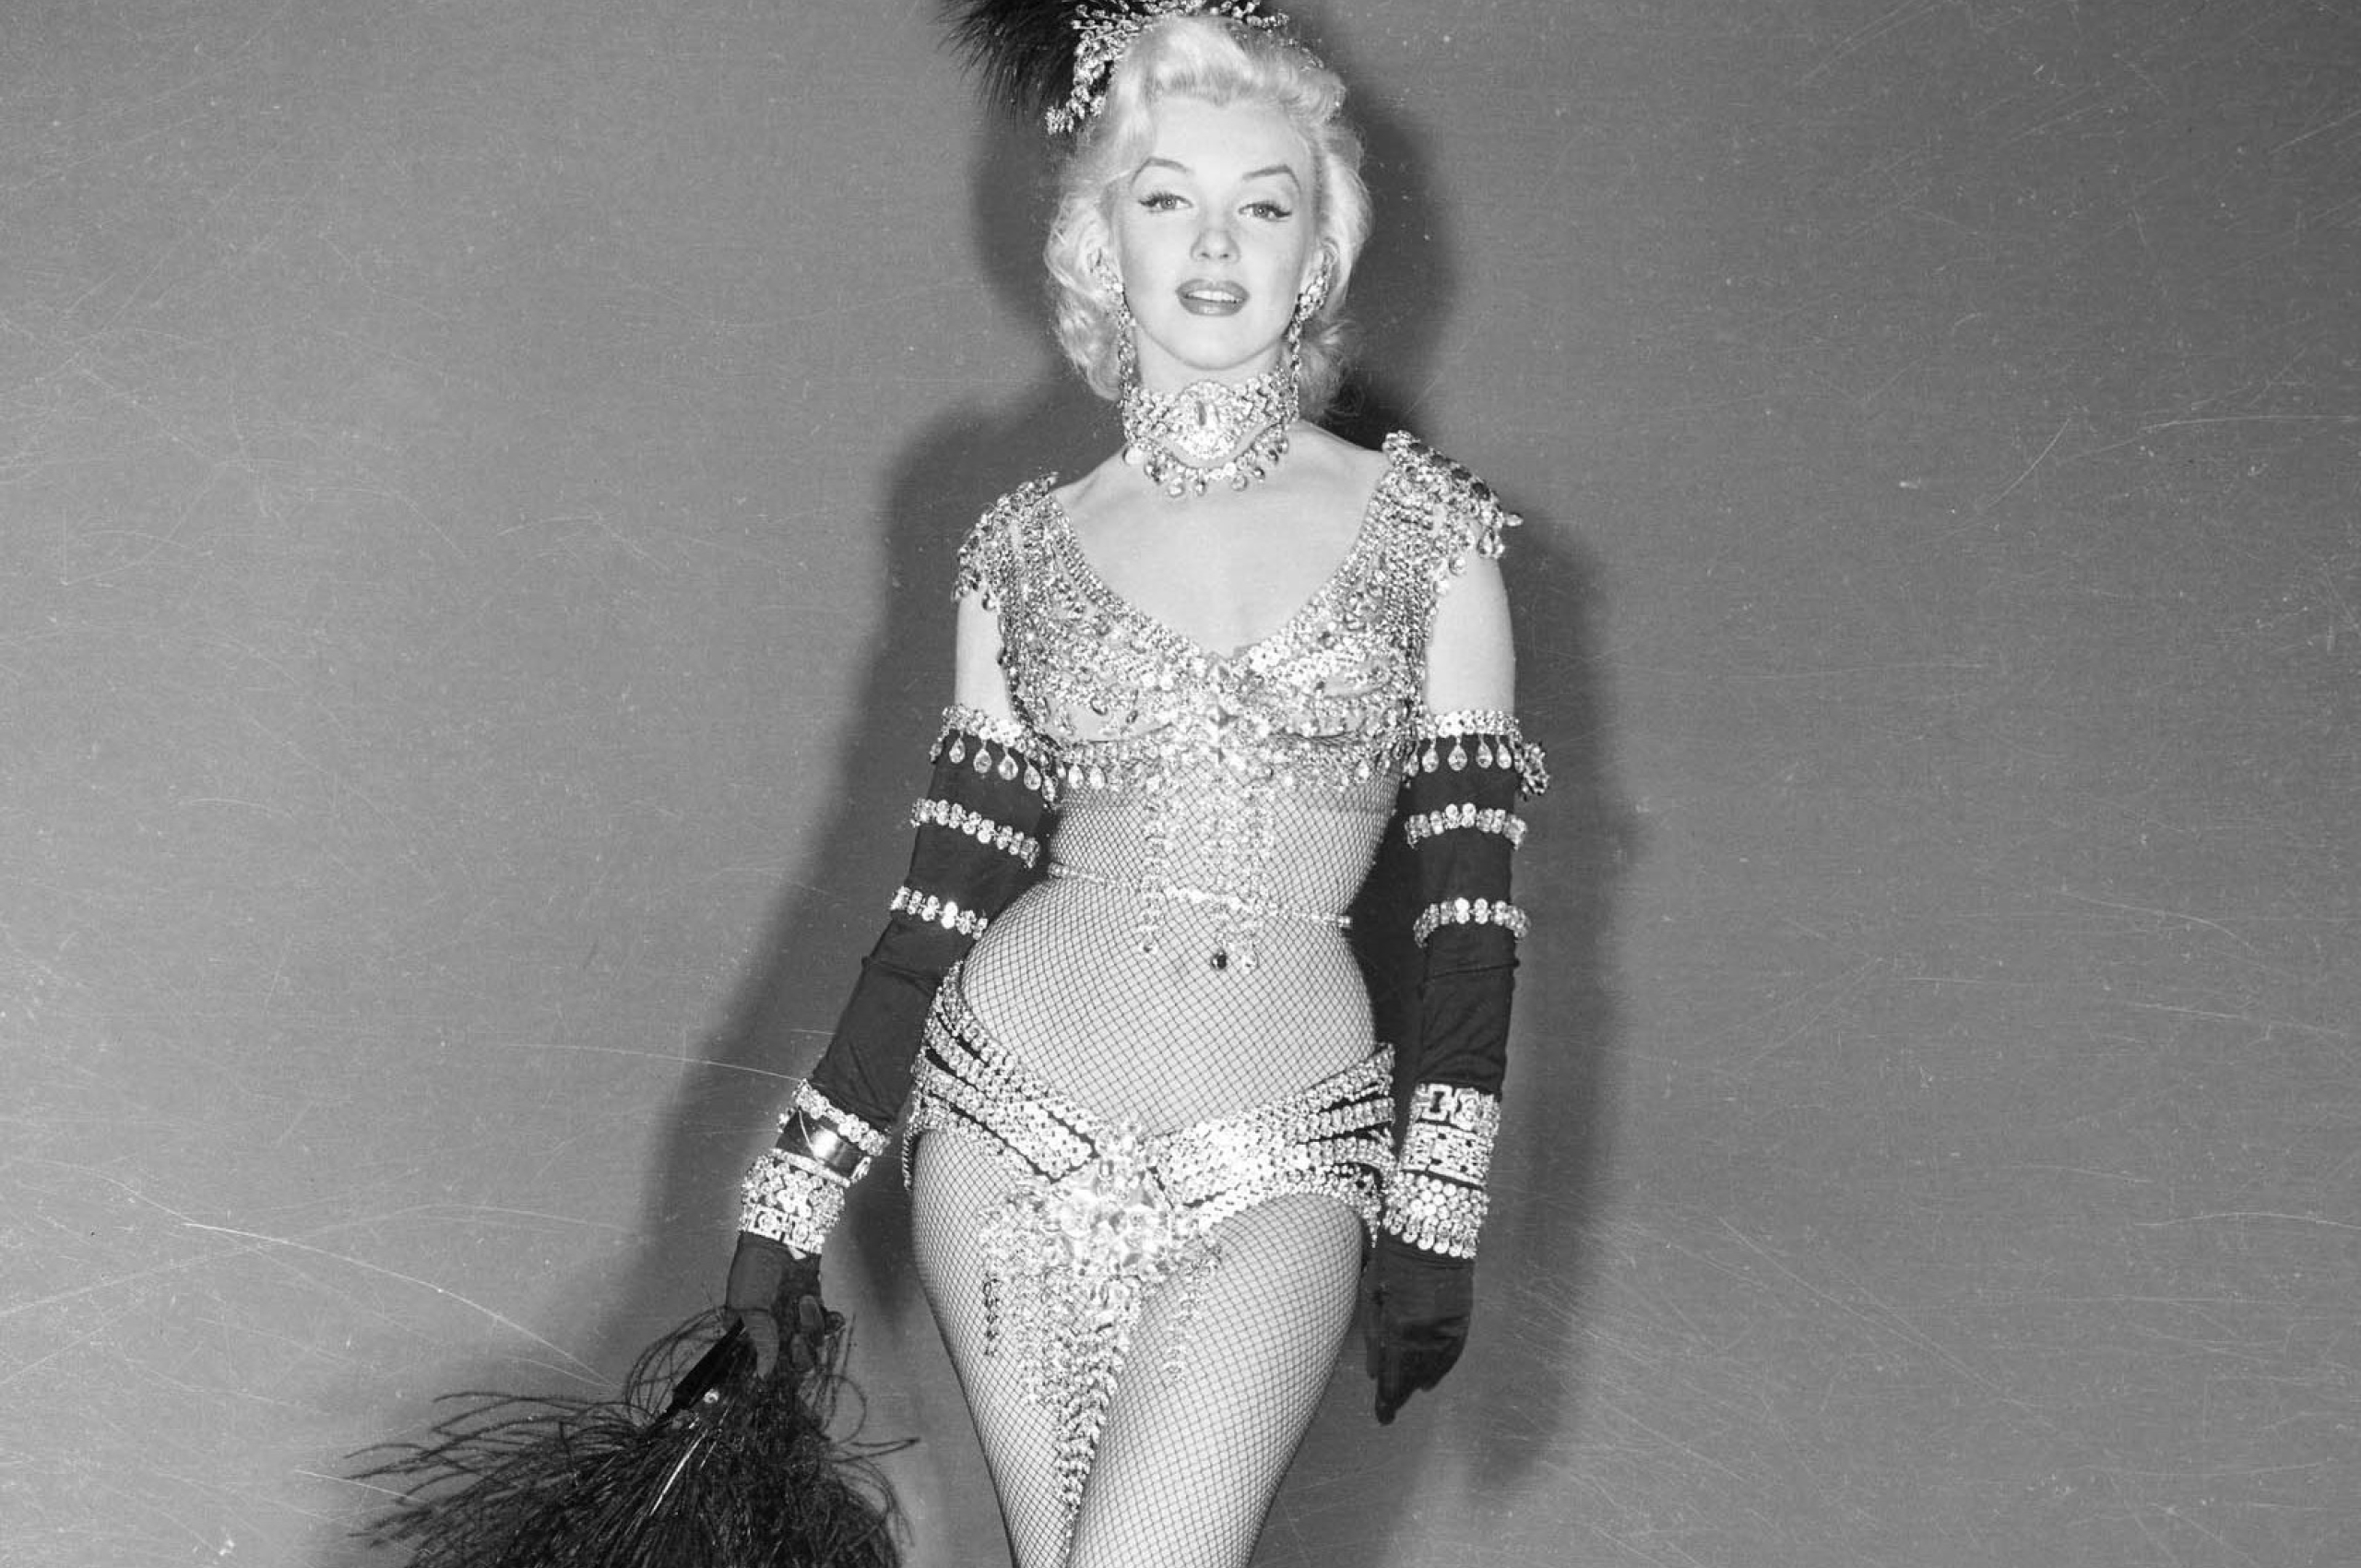 2560x1700 Marilyn Monroe New Look Chromebook Pixel Wallpaper Hd